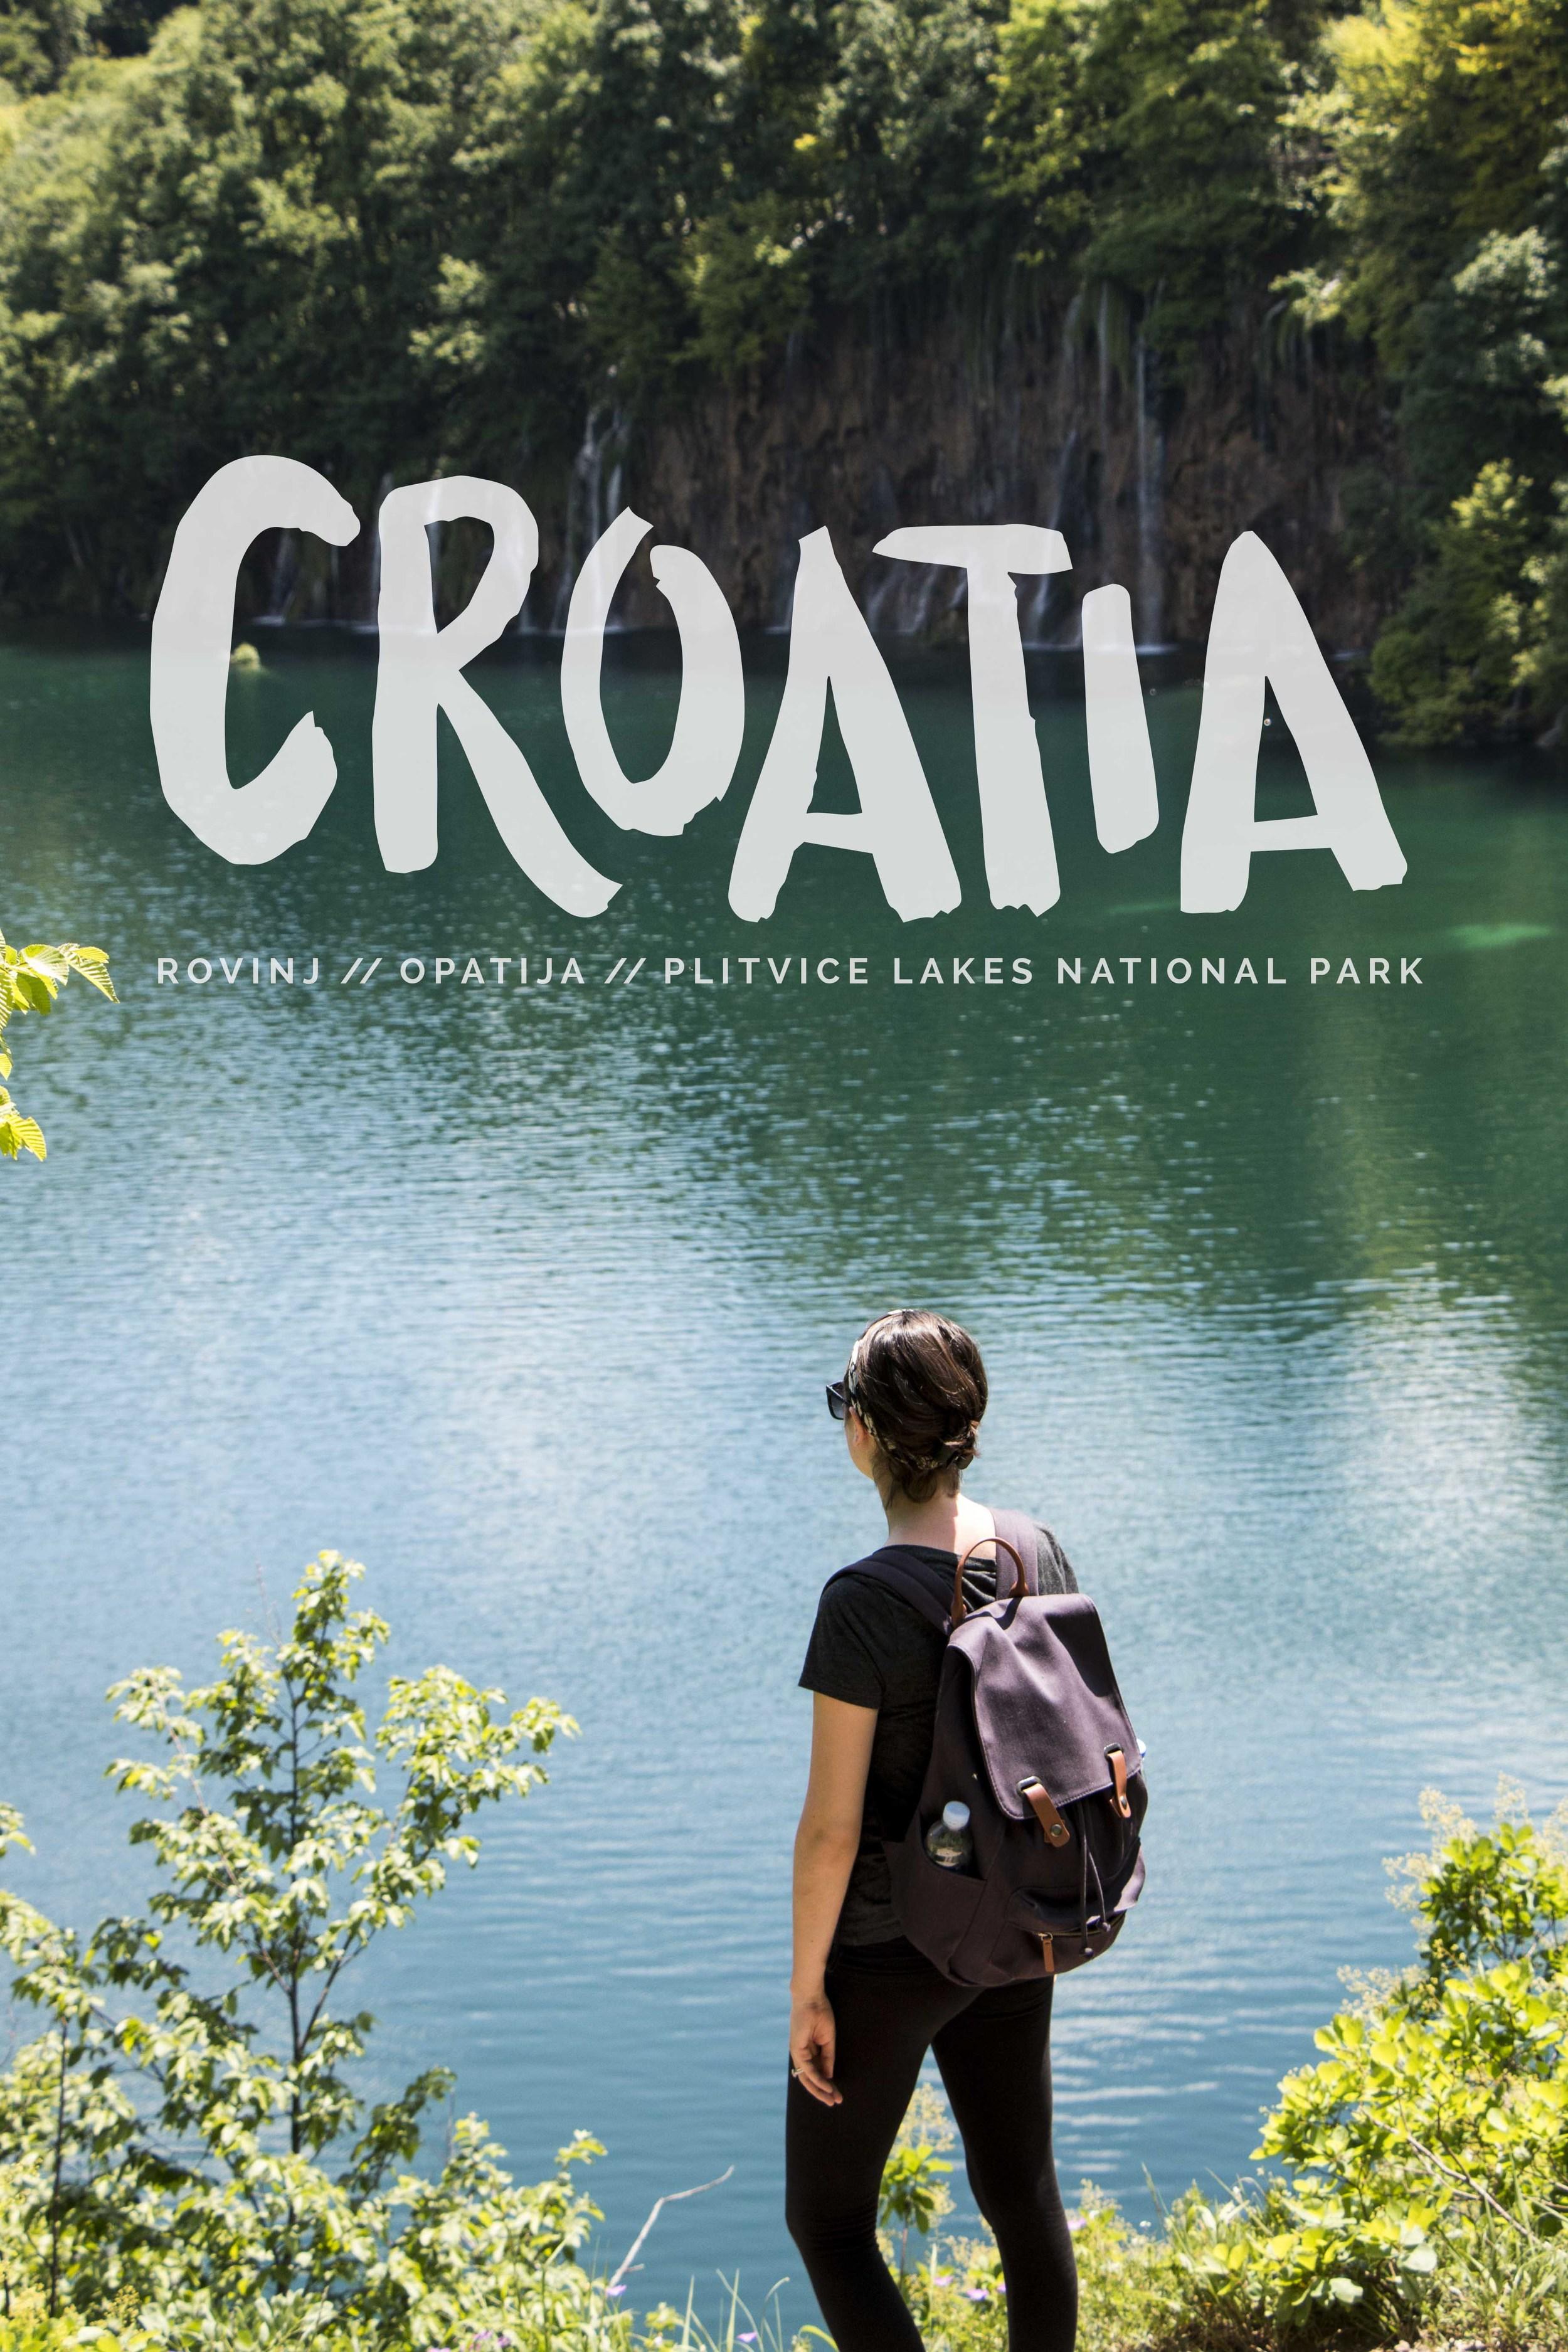 SOA_Croatia.jpg